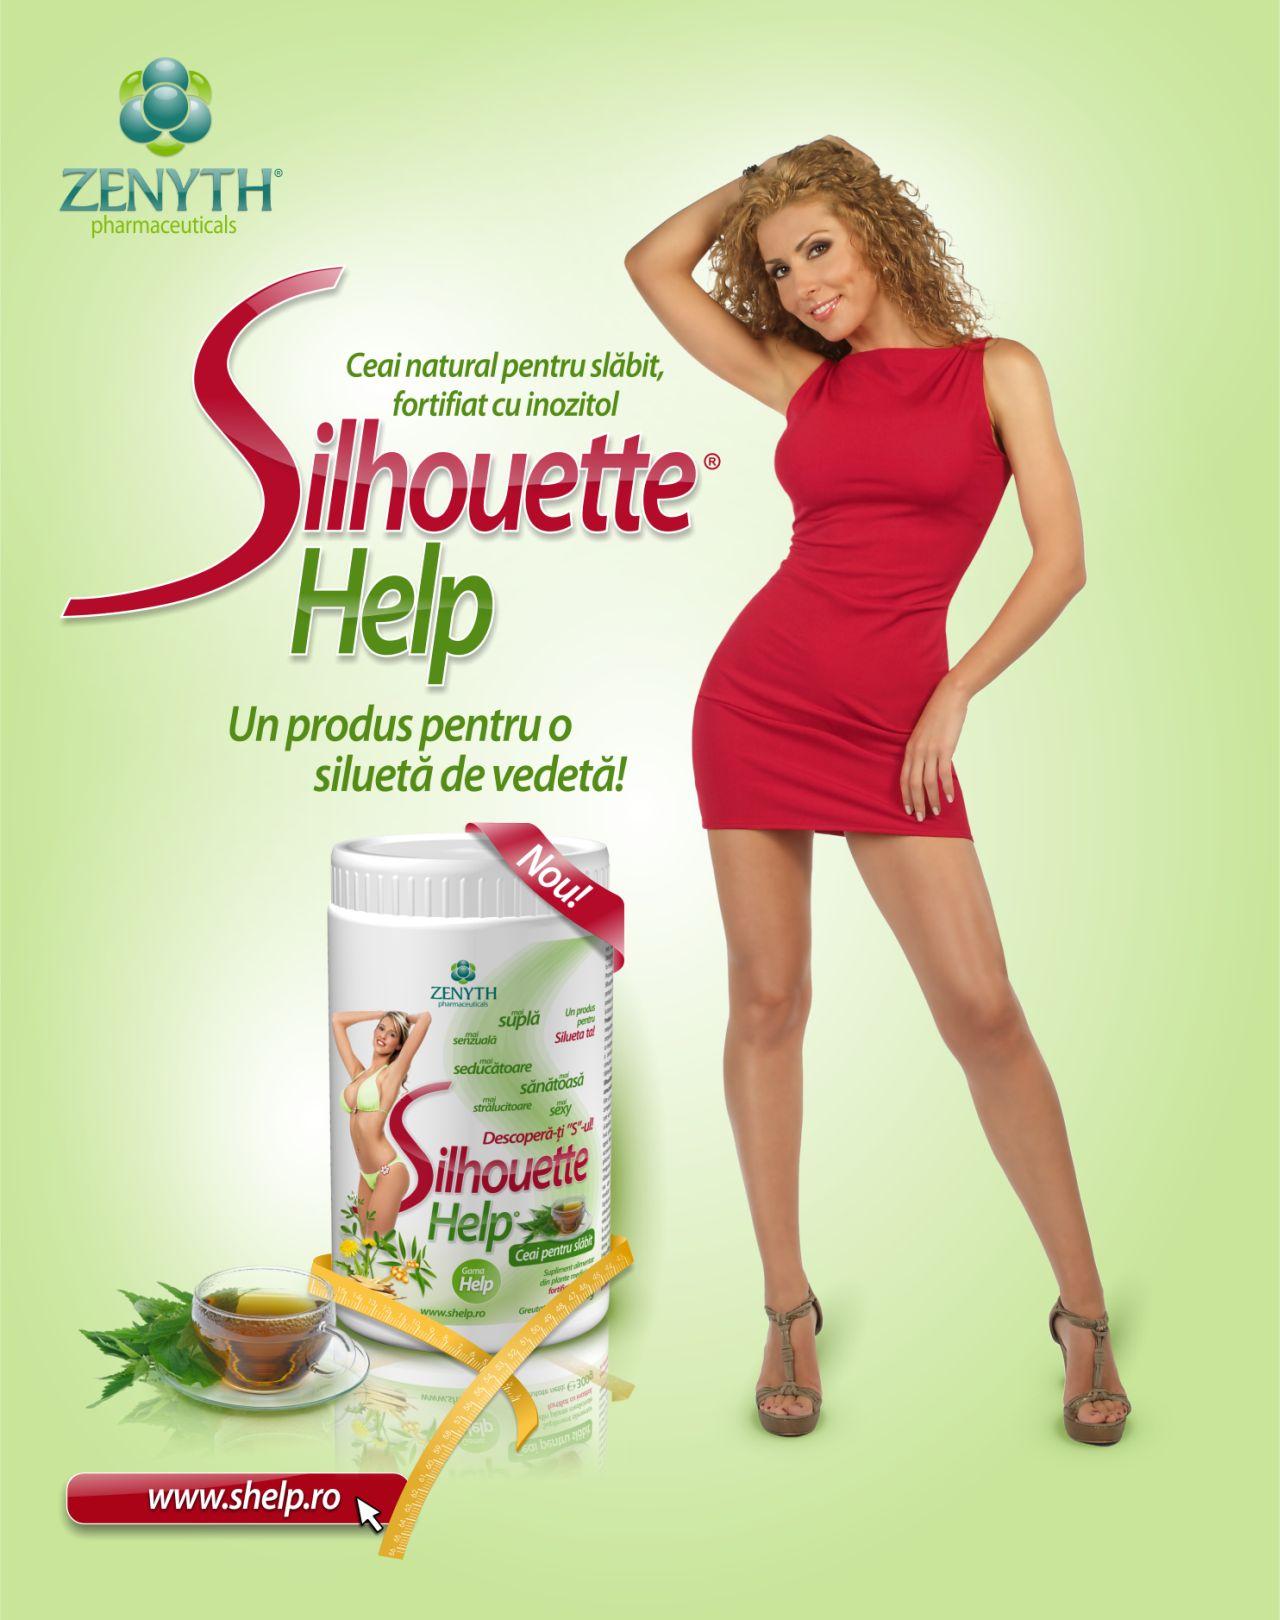 Produse naturiste ZENYTH PHARMACEUTICALS SRL - SILHOUETTE HELP (ceai de slabit) 450g ZENYTH